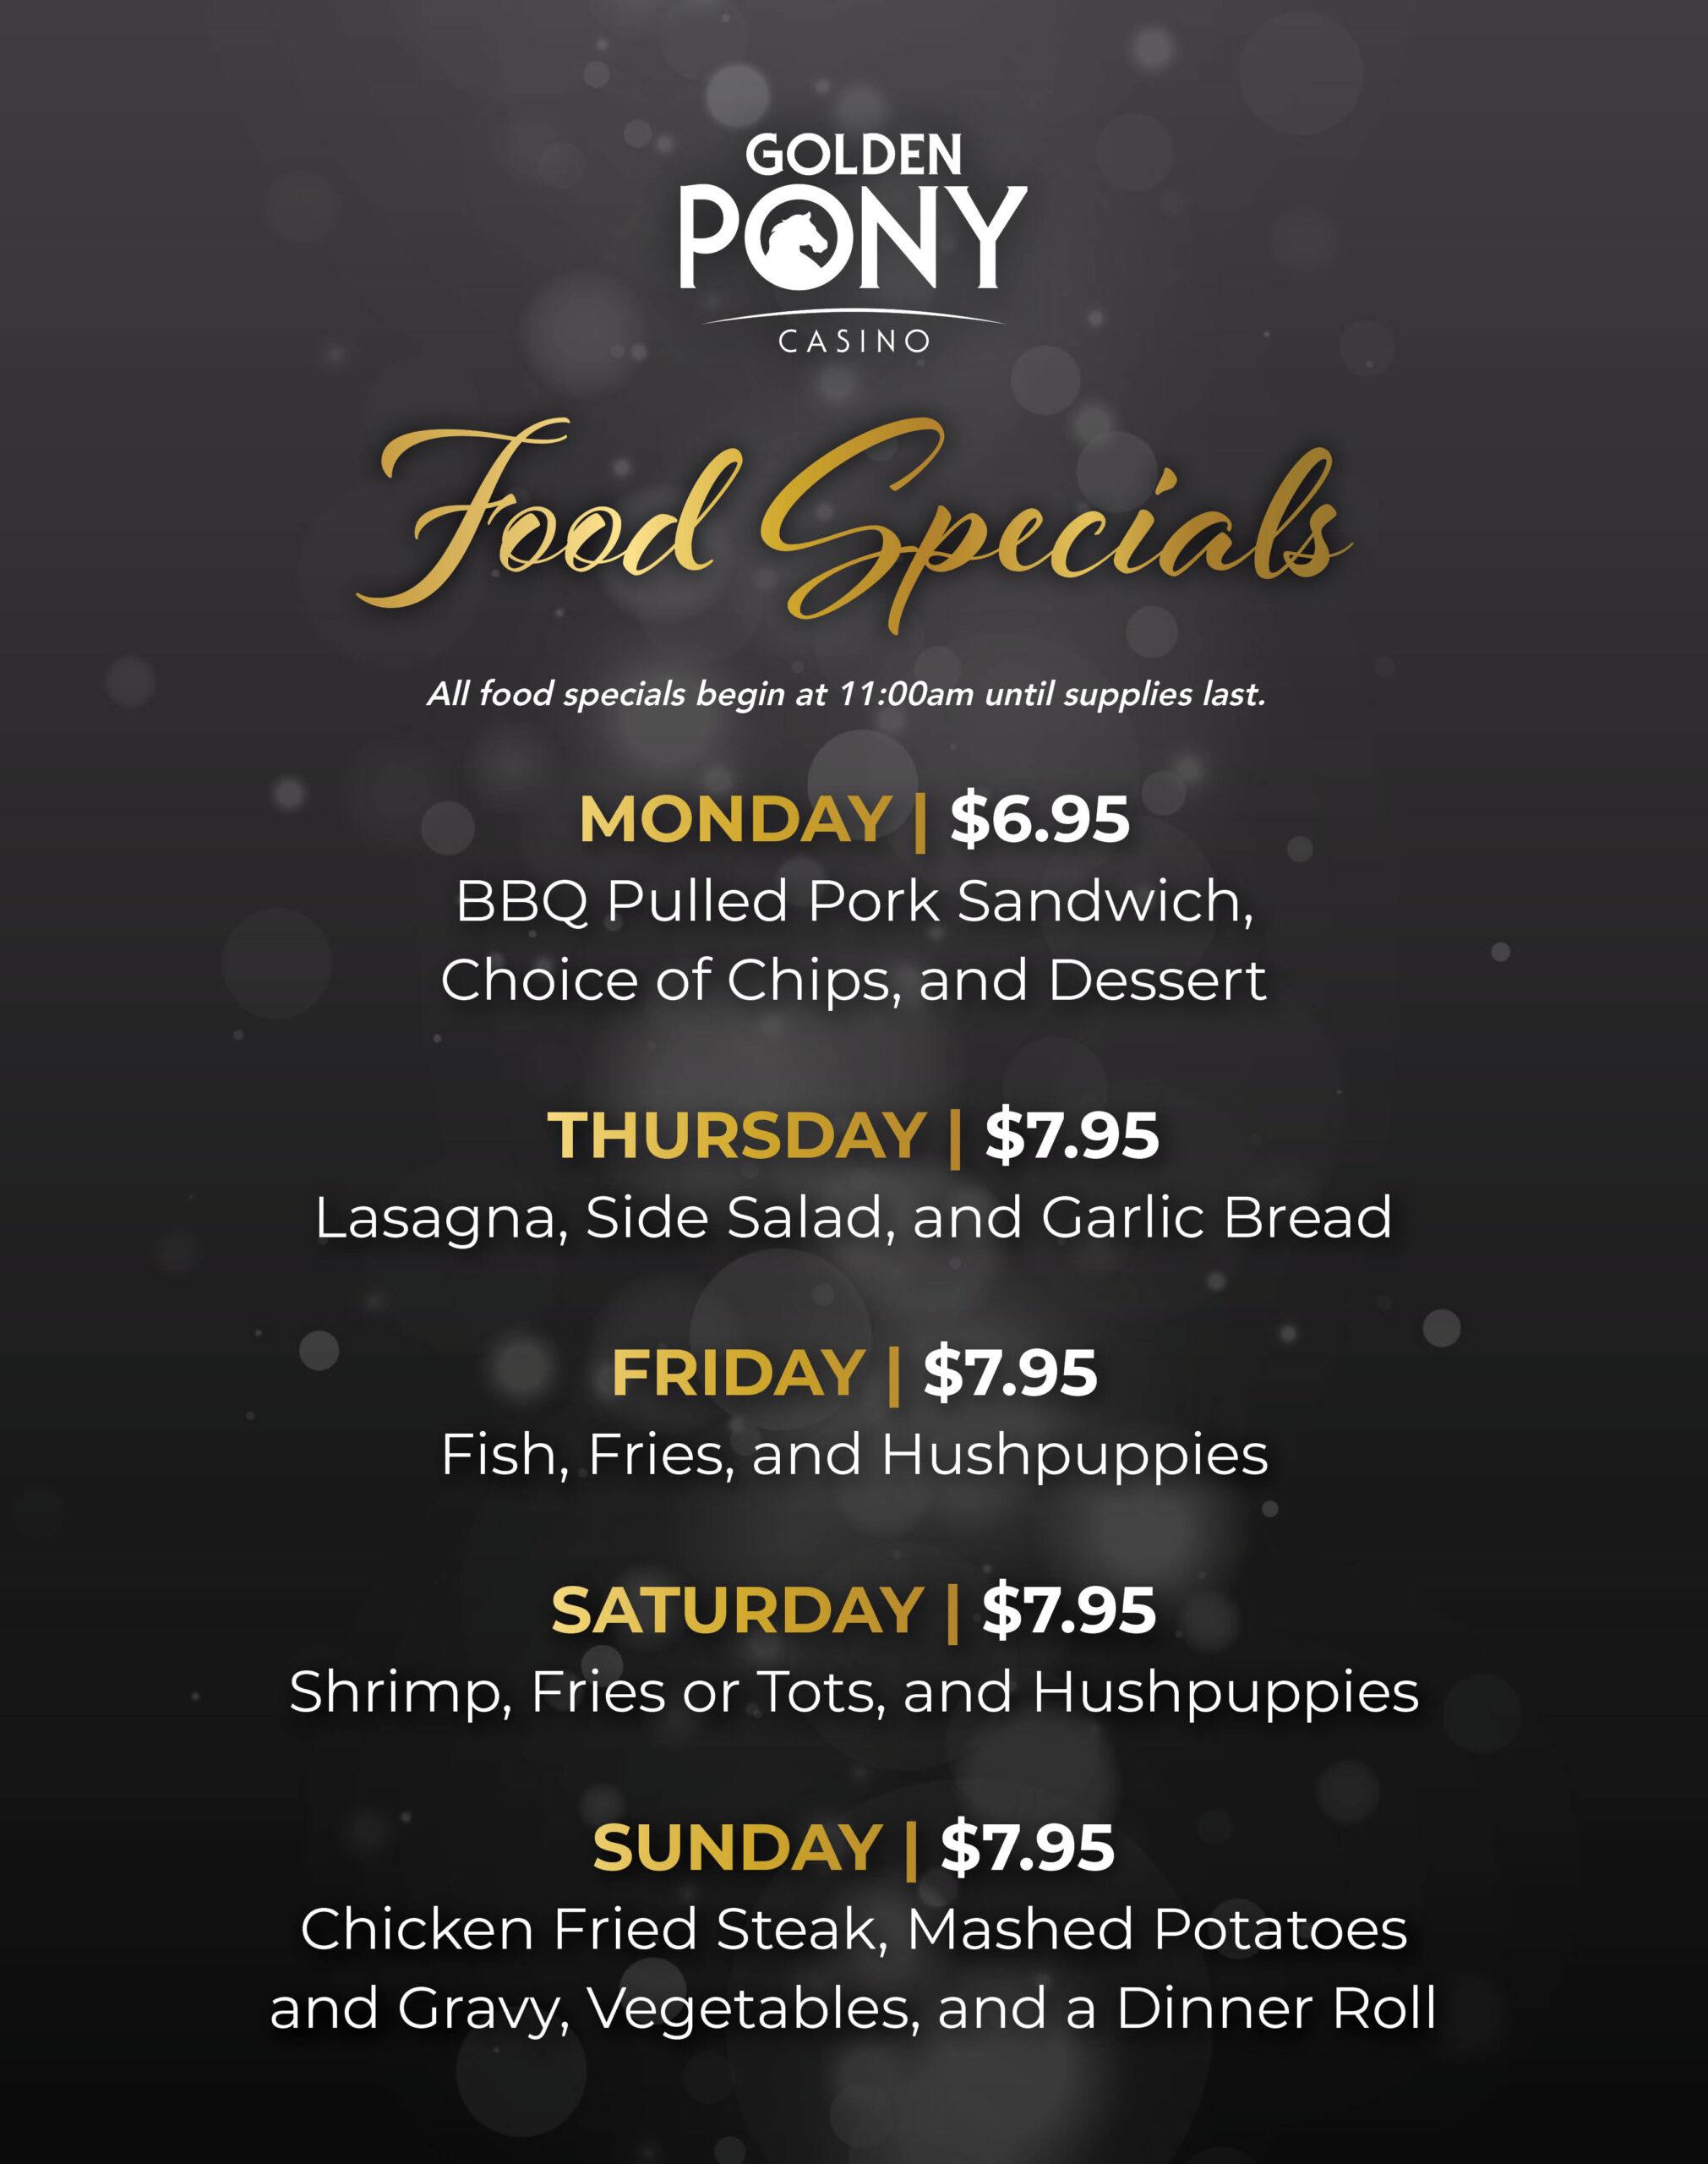 Golden Pony Casino Food Specials